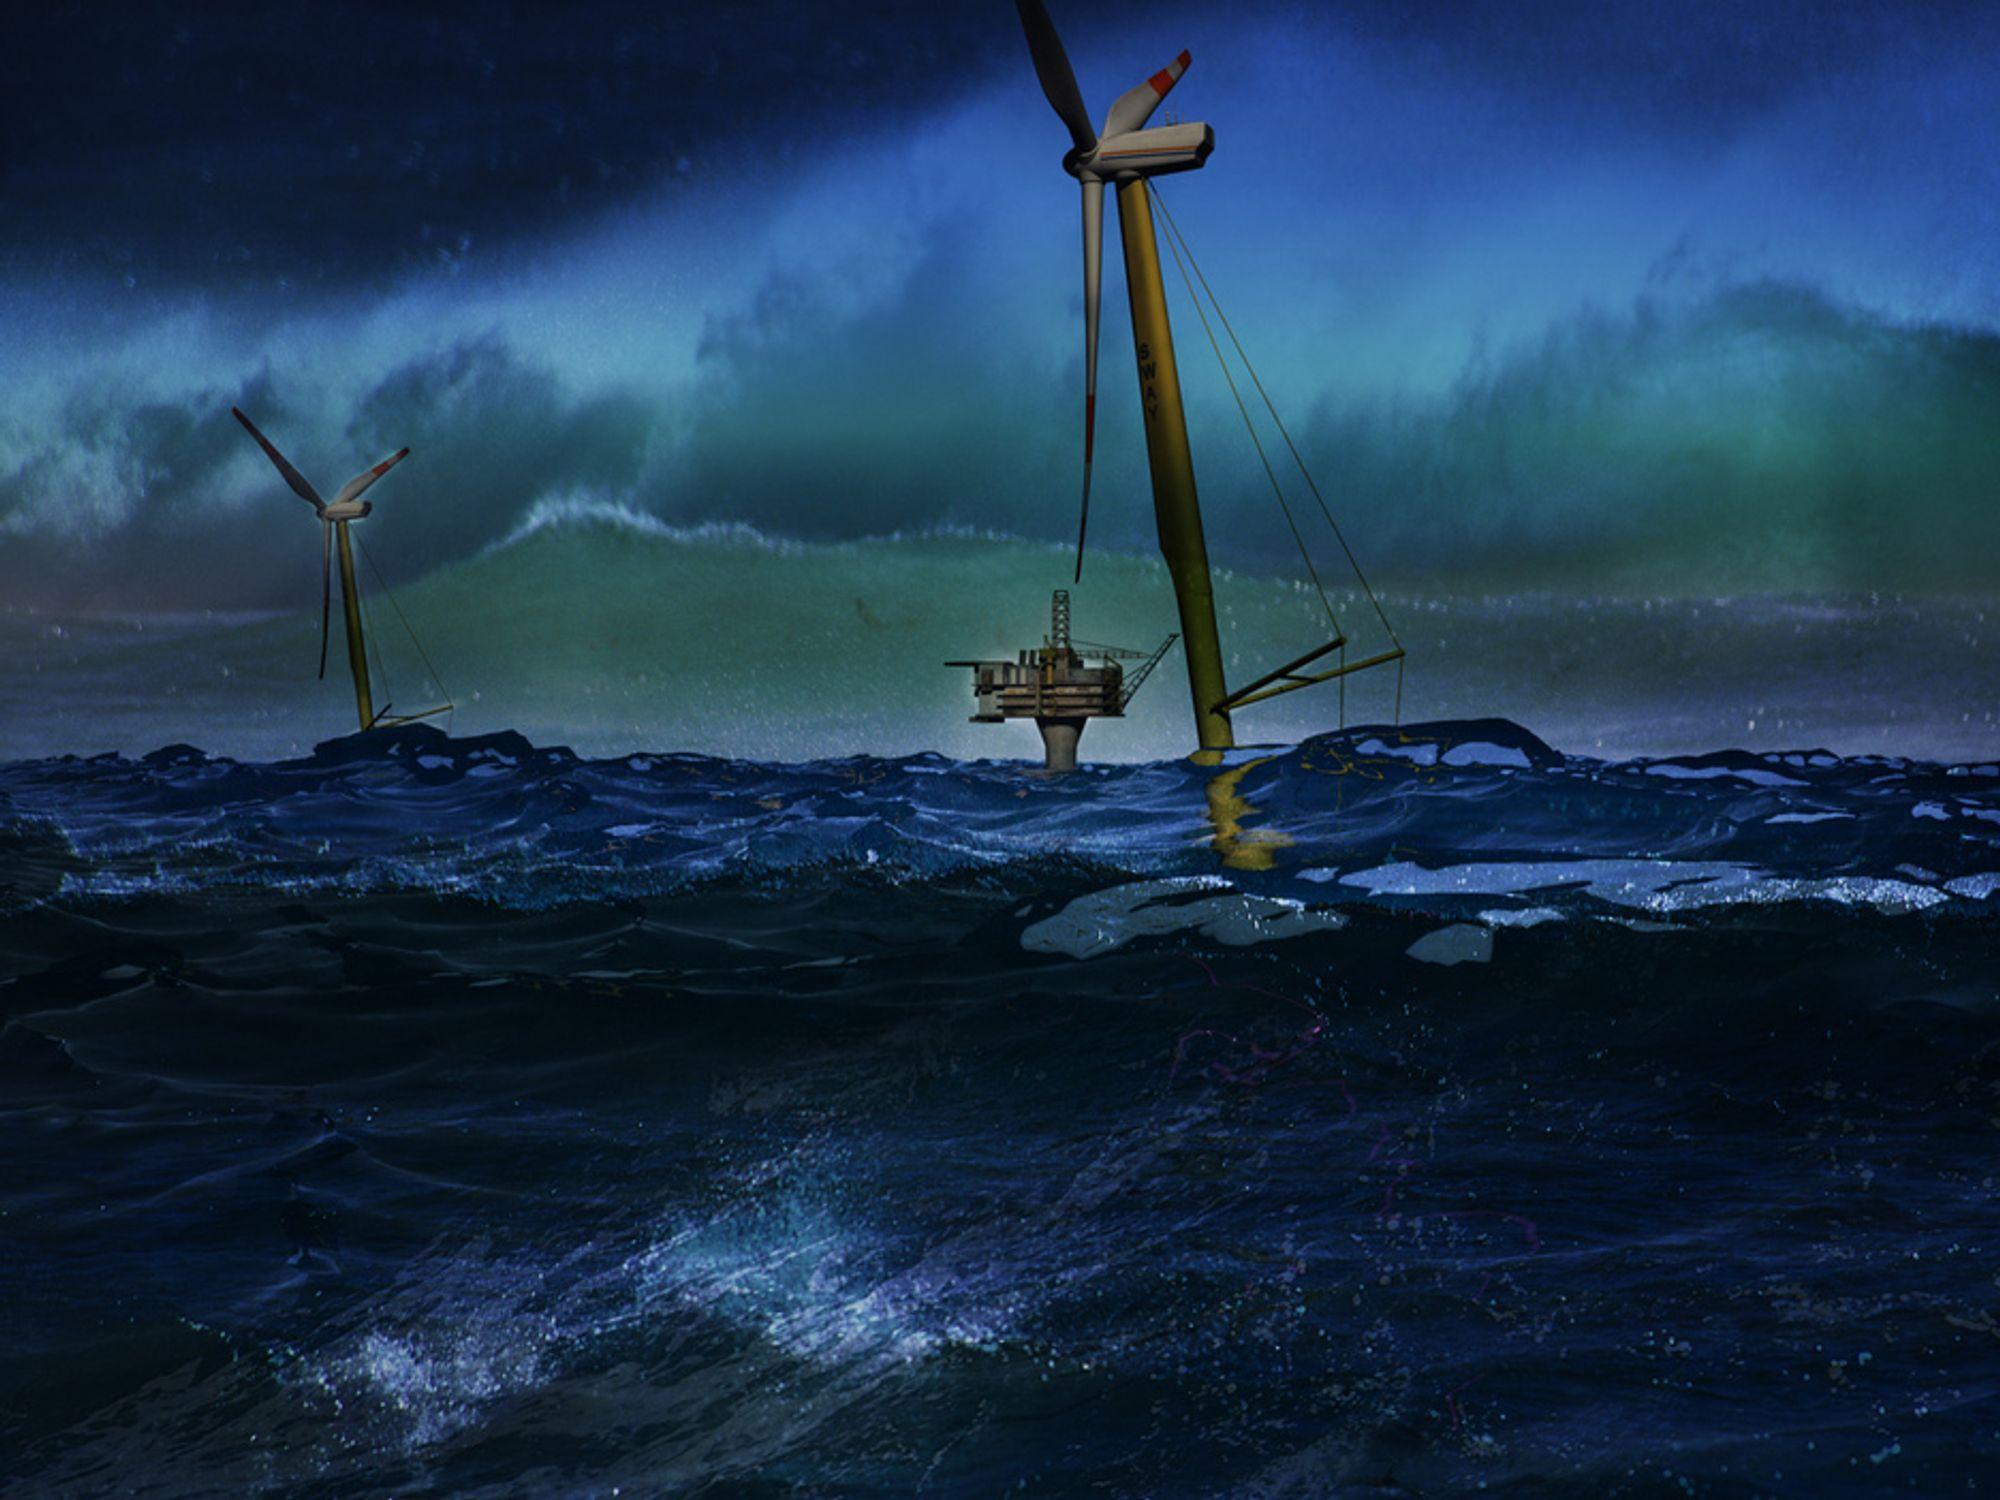 VIND TIL HAVS: Ute på havet vil ikke vindturbinene være til sjenanse for vanlige folk, kun for skipstrafikken. Forskere mener satsing på vindkraft til havs bør være Norges månelanding.